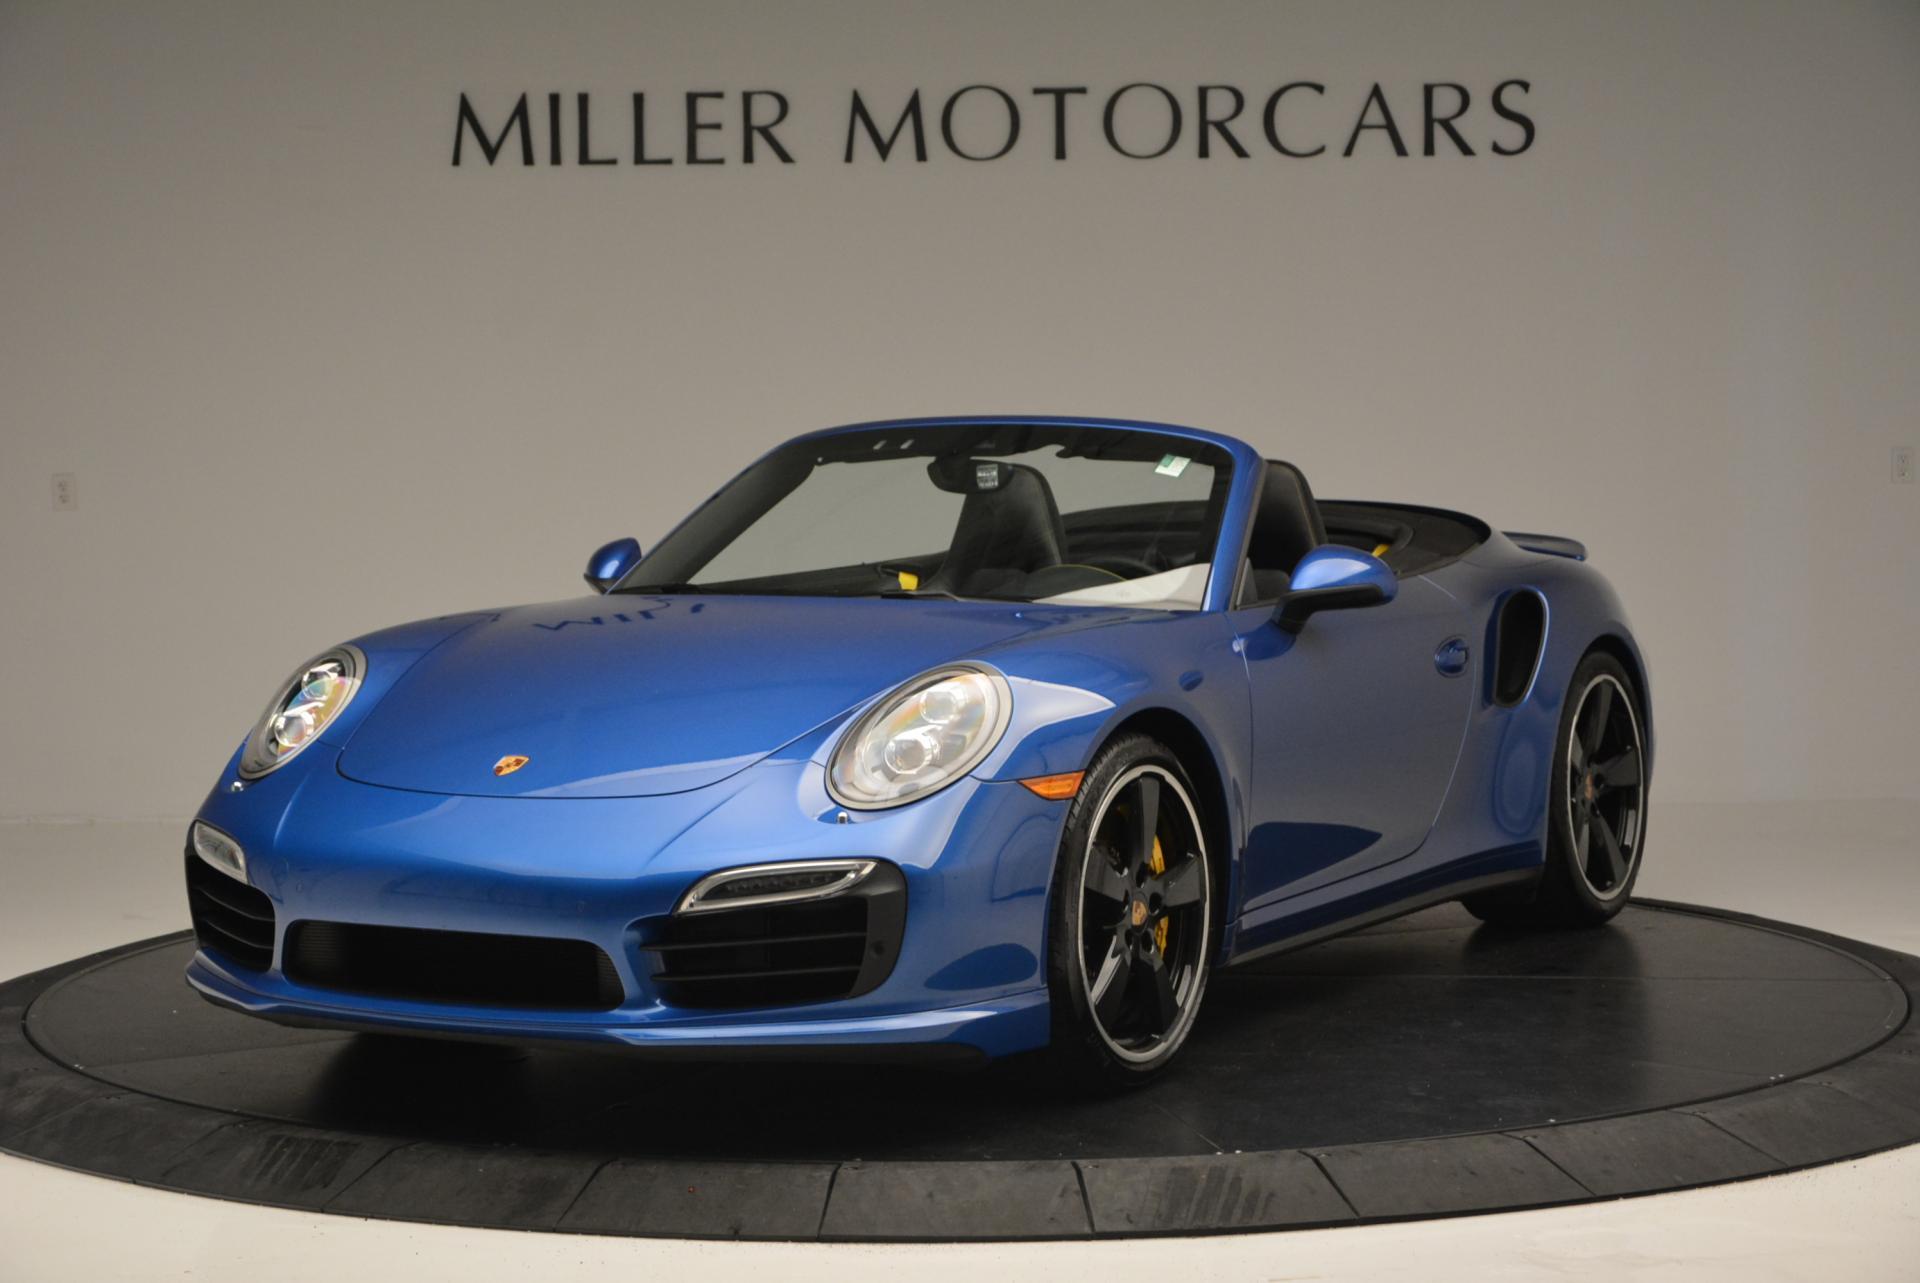 Used 2014 Porsche 911 Turbo S For Sale In Westport, CT 105_main